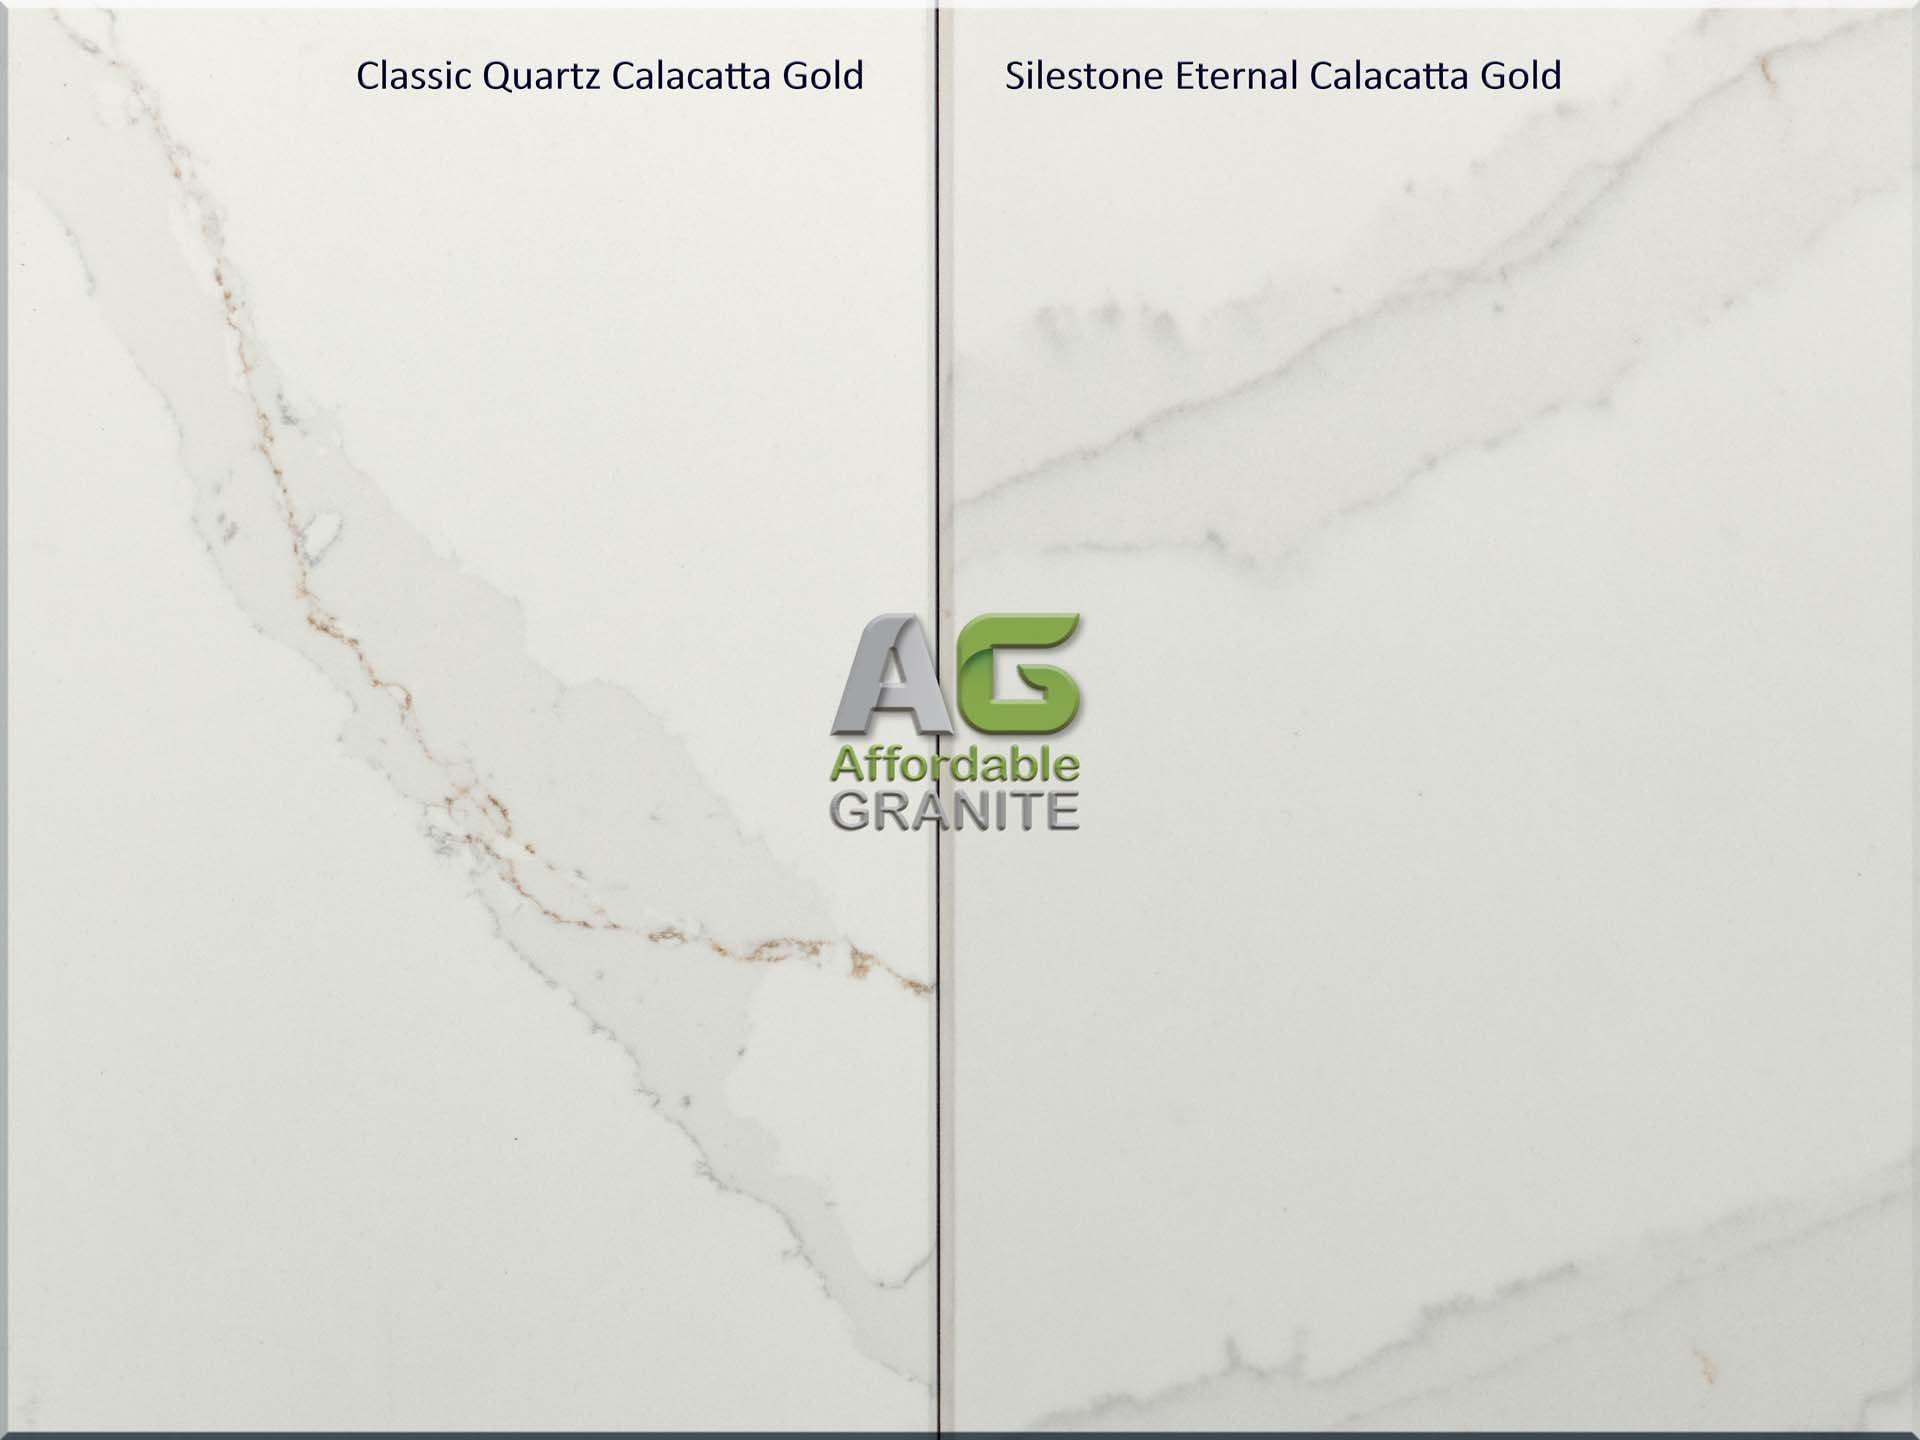 CQ Calacatta Gold and Silestone Calacatta Golda